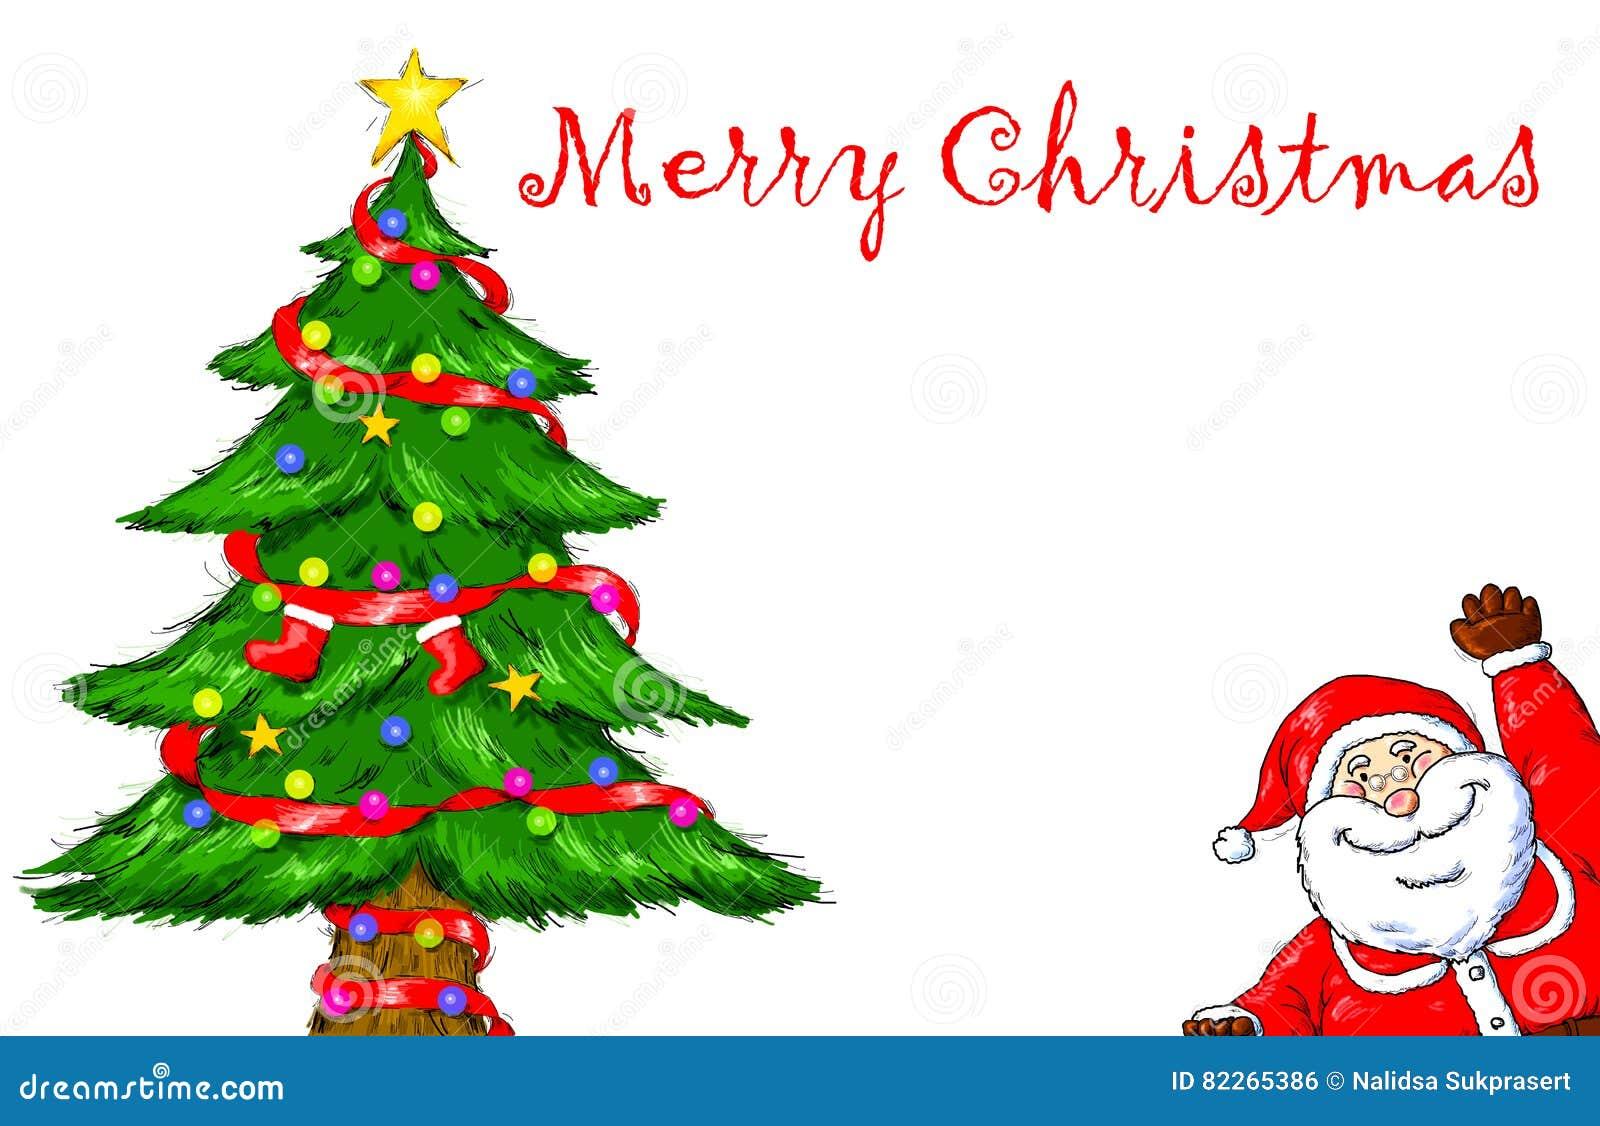 Merry Christmas Santa Claus Tree Celebration Stock